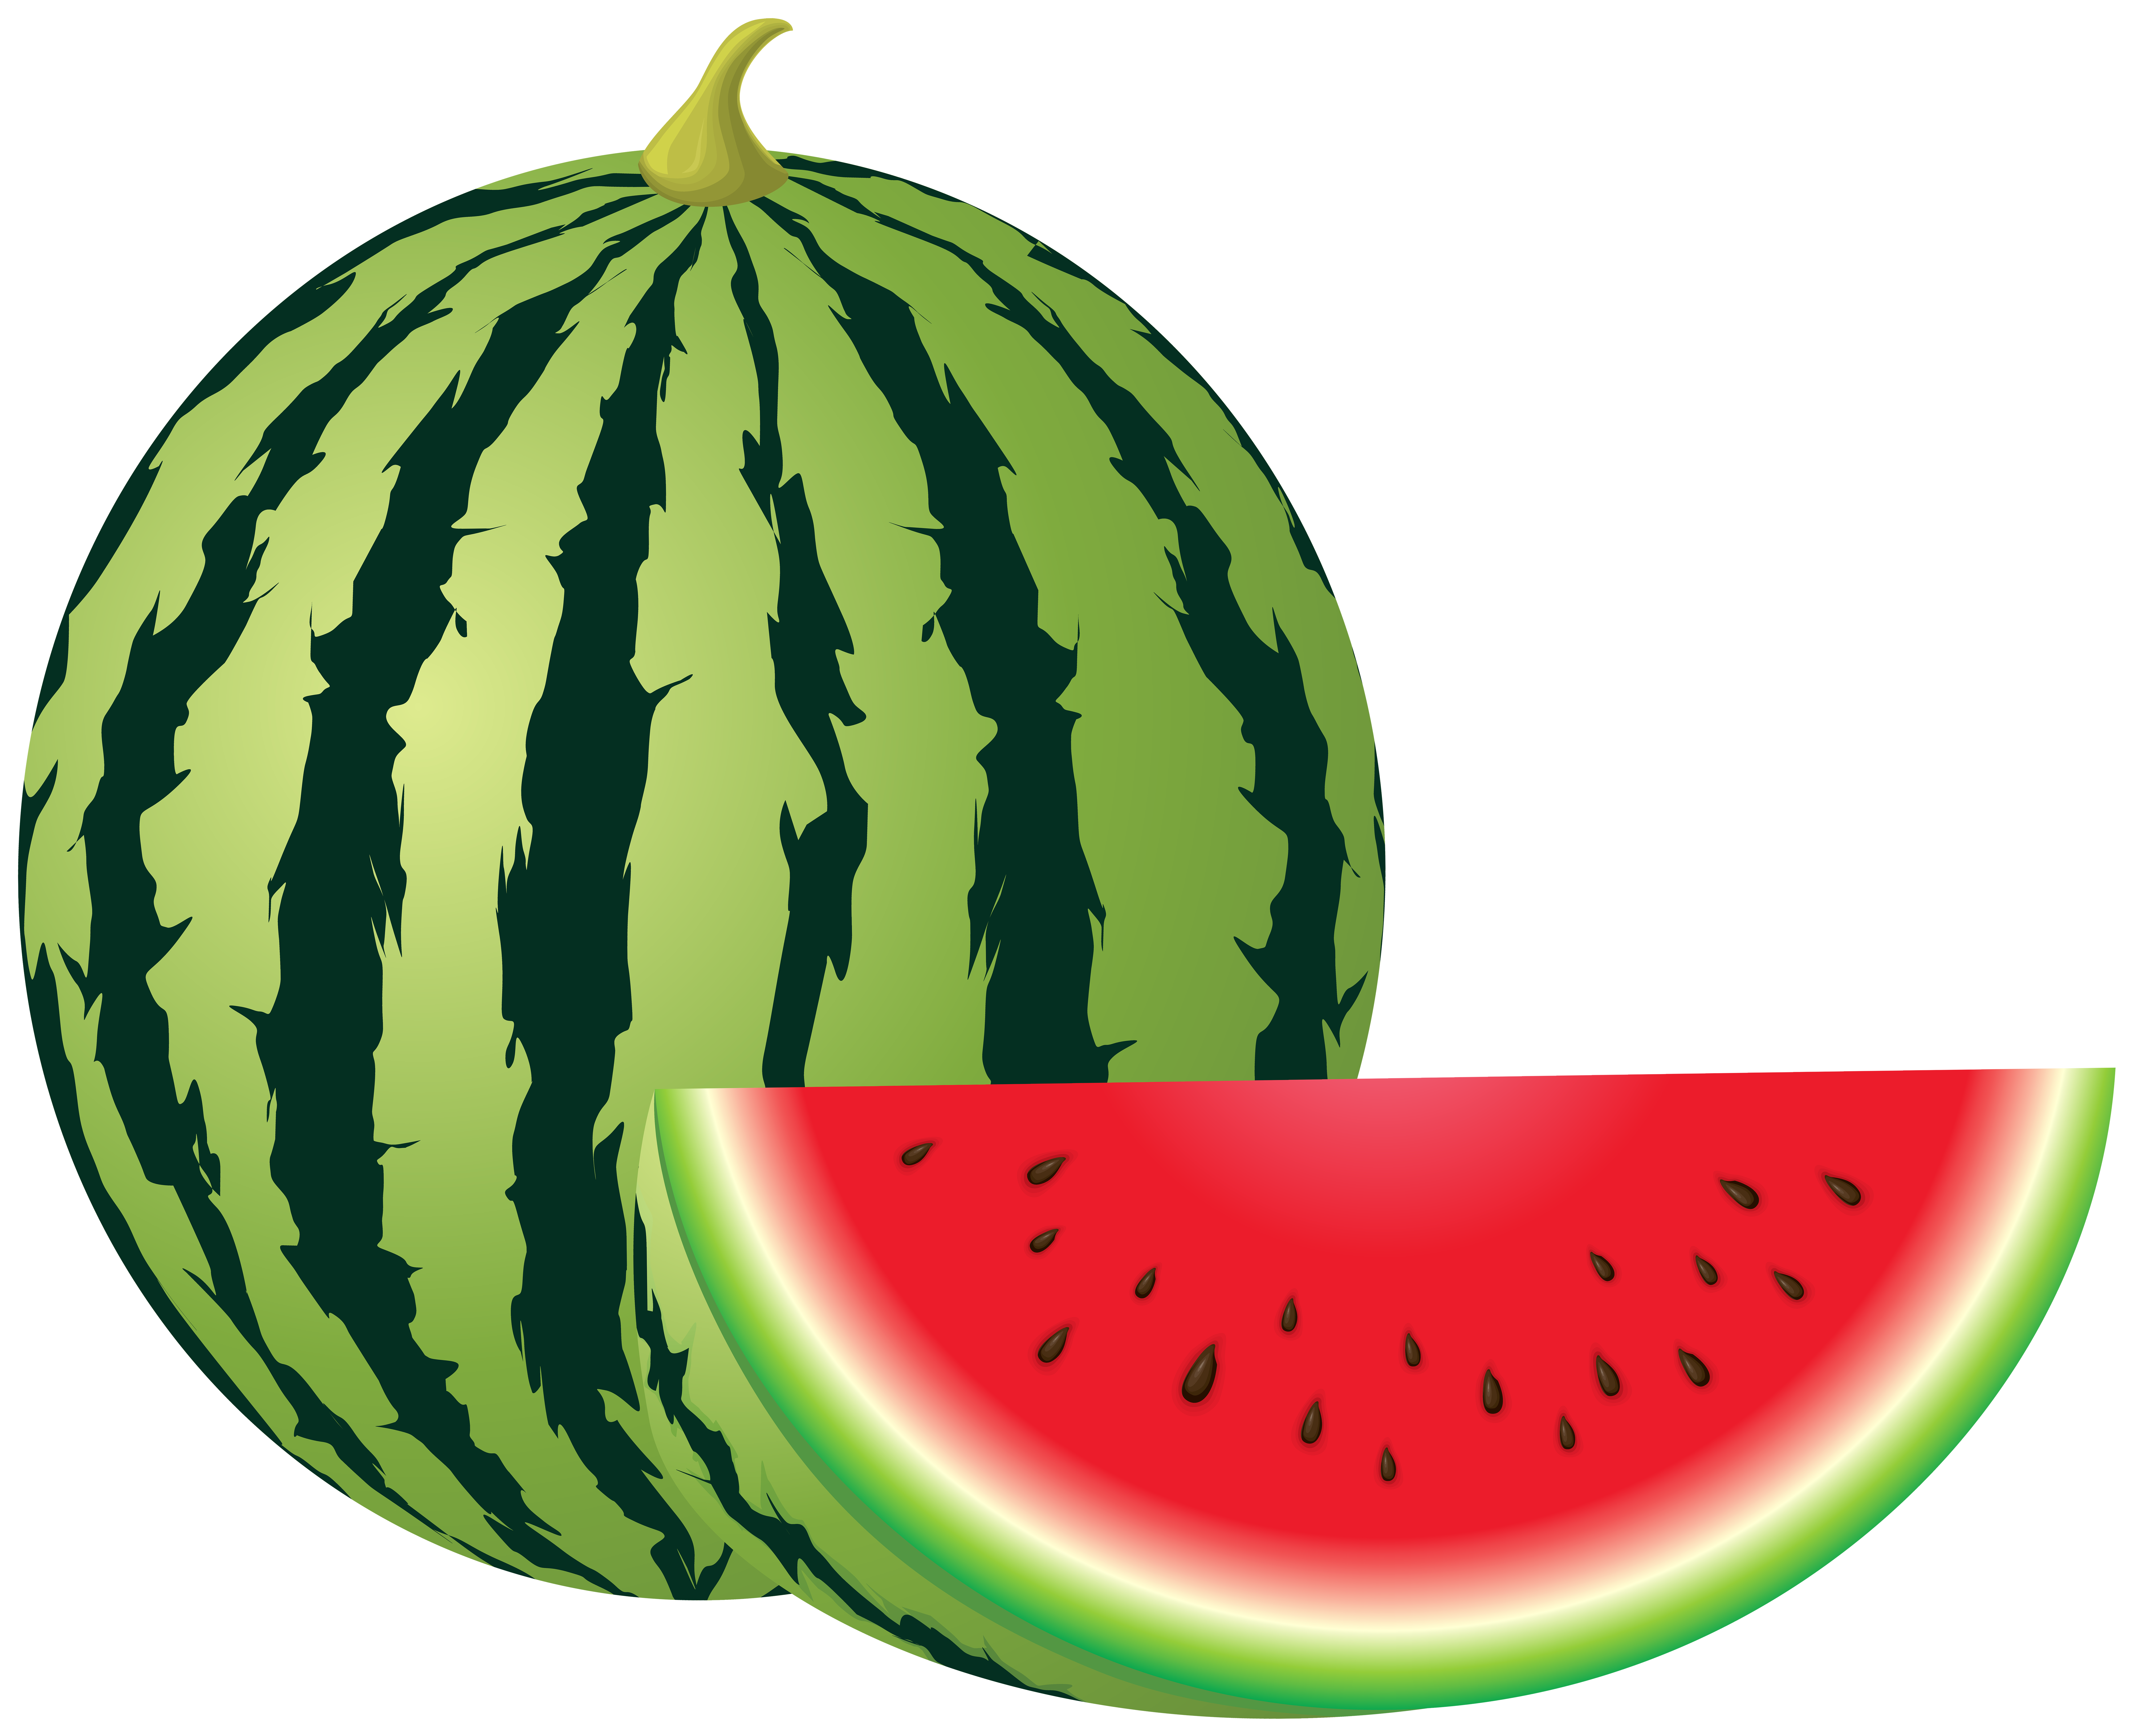 Watermelon clipart cucumber melon. Png clip art image